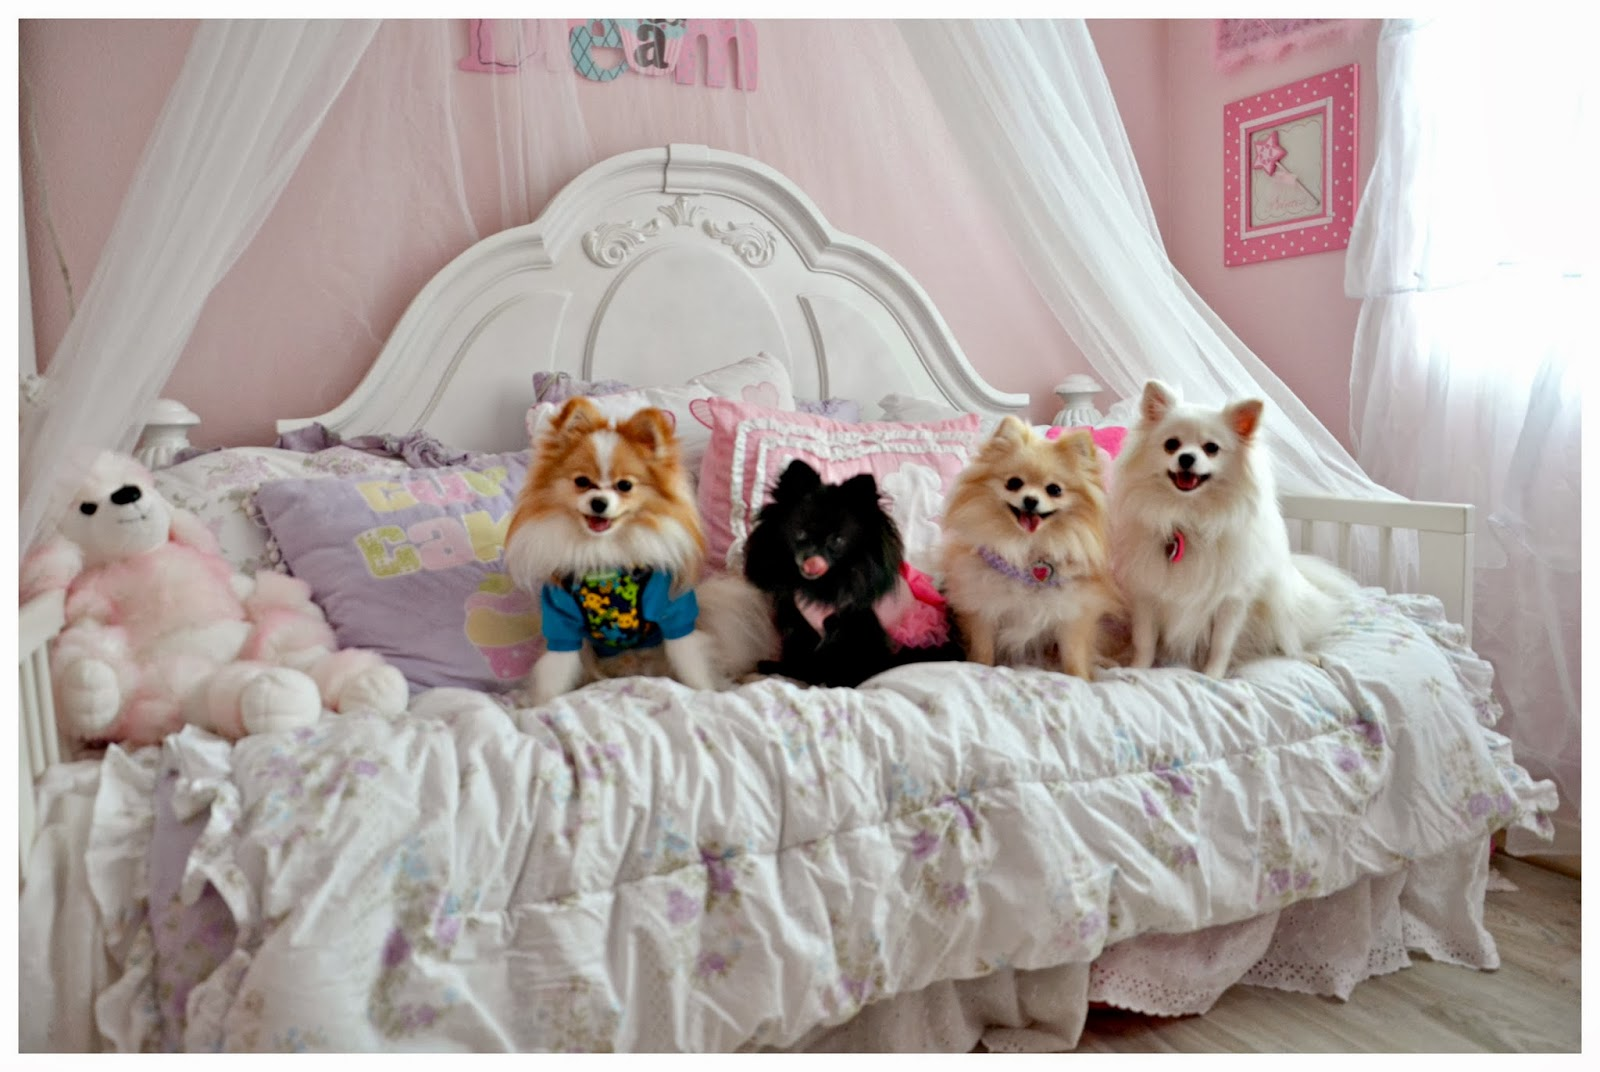 Not So Shabby - Shabby Chic: New floors in the doggie playroom